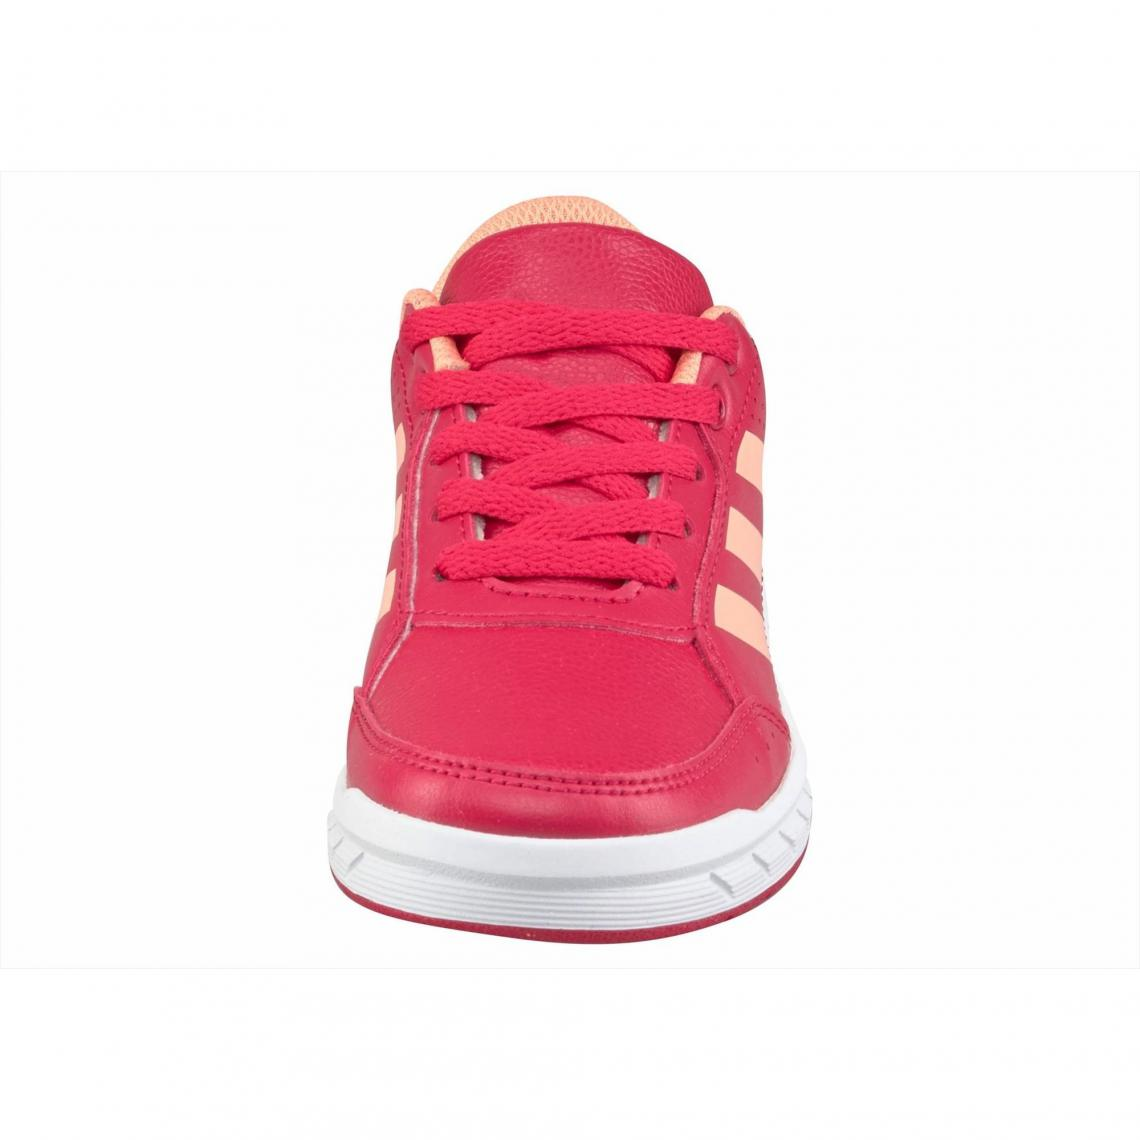 Chaussure 3suisses Altasport Sport Kids Rouge Adidas De Performance WZFwqH6